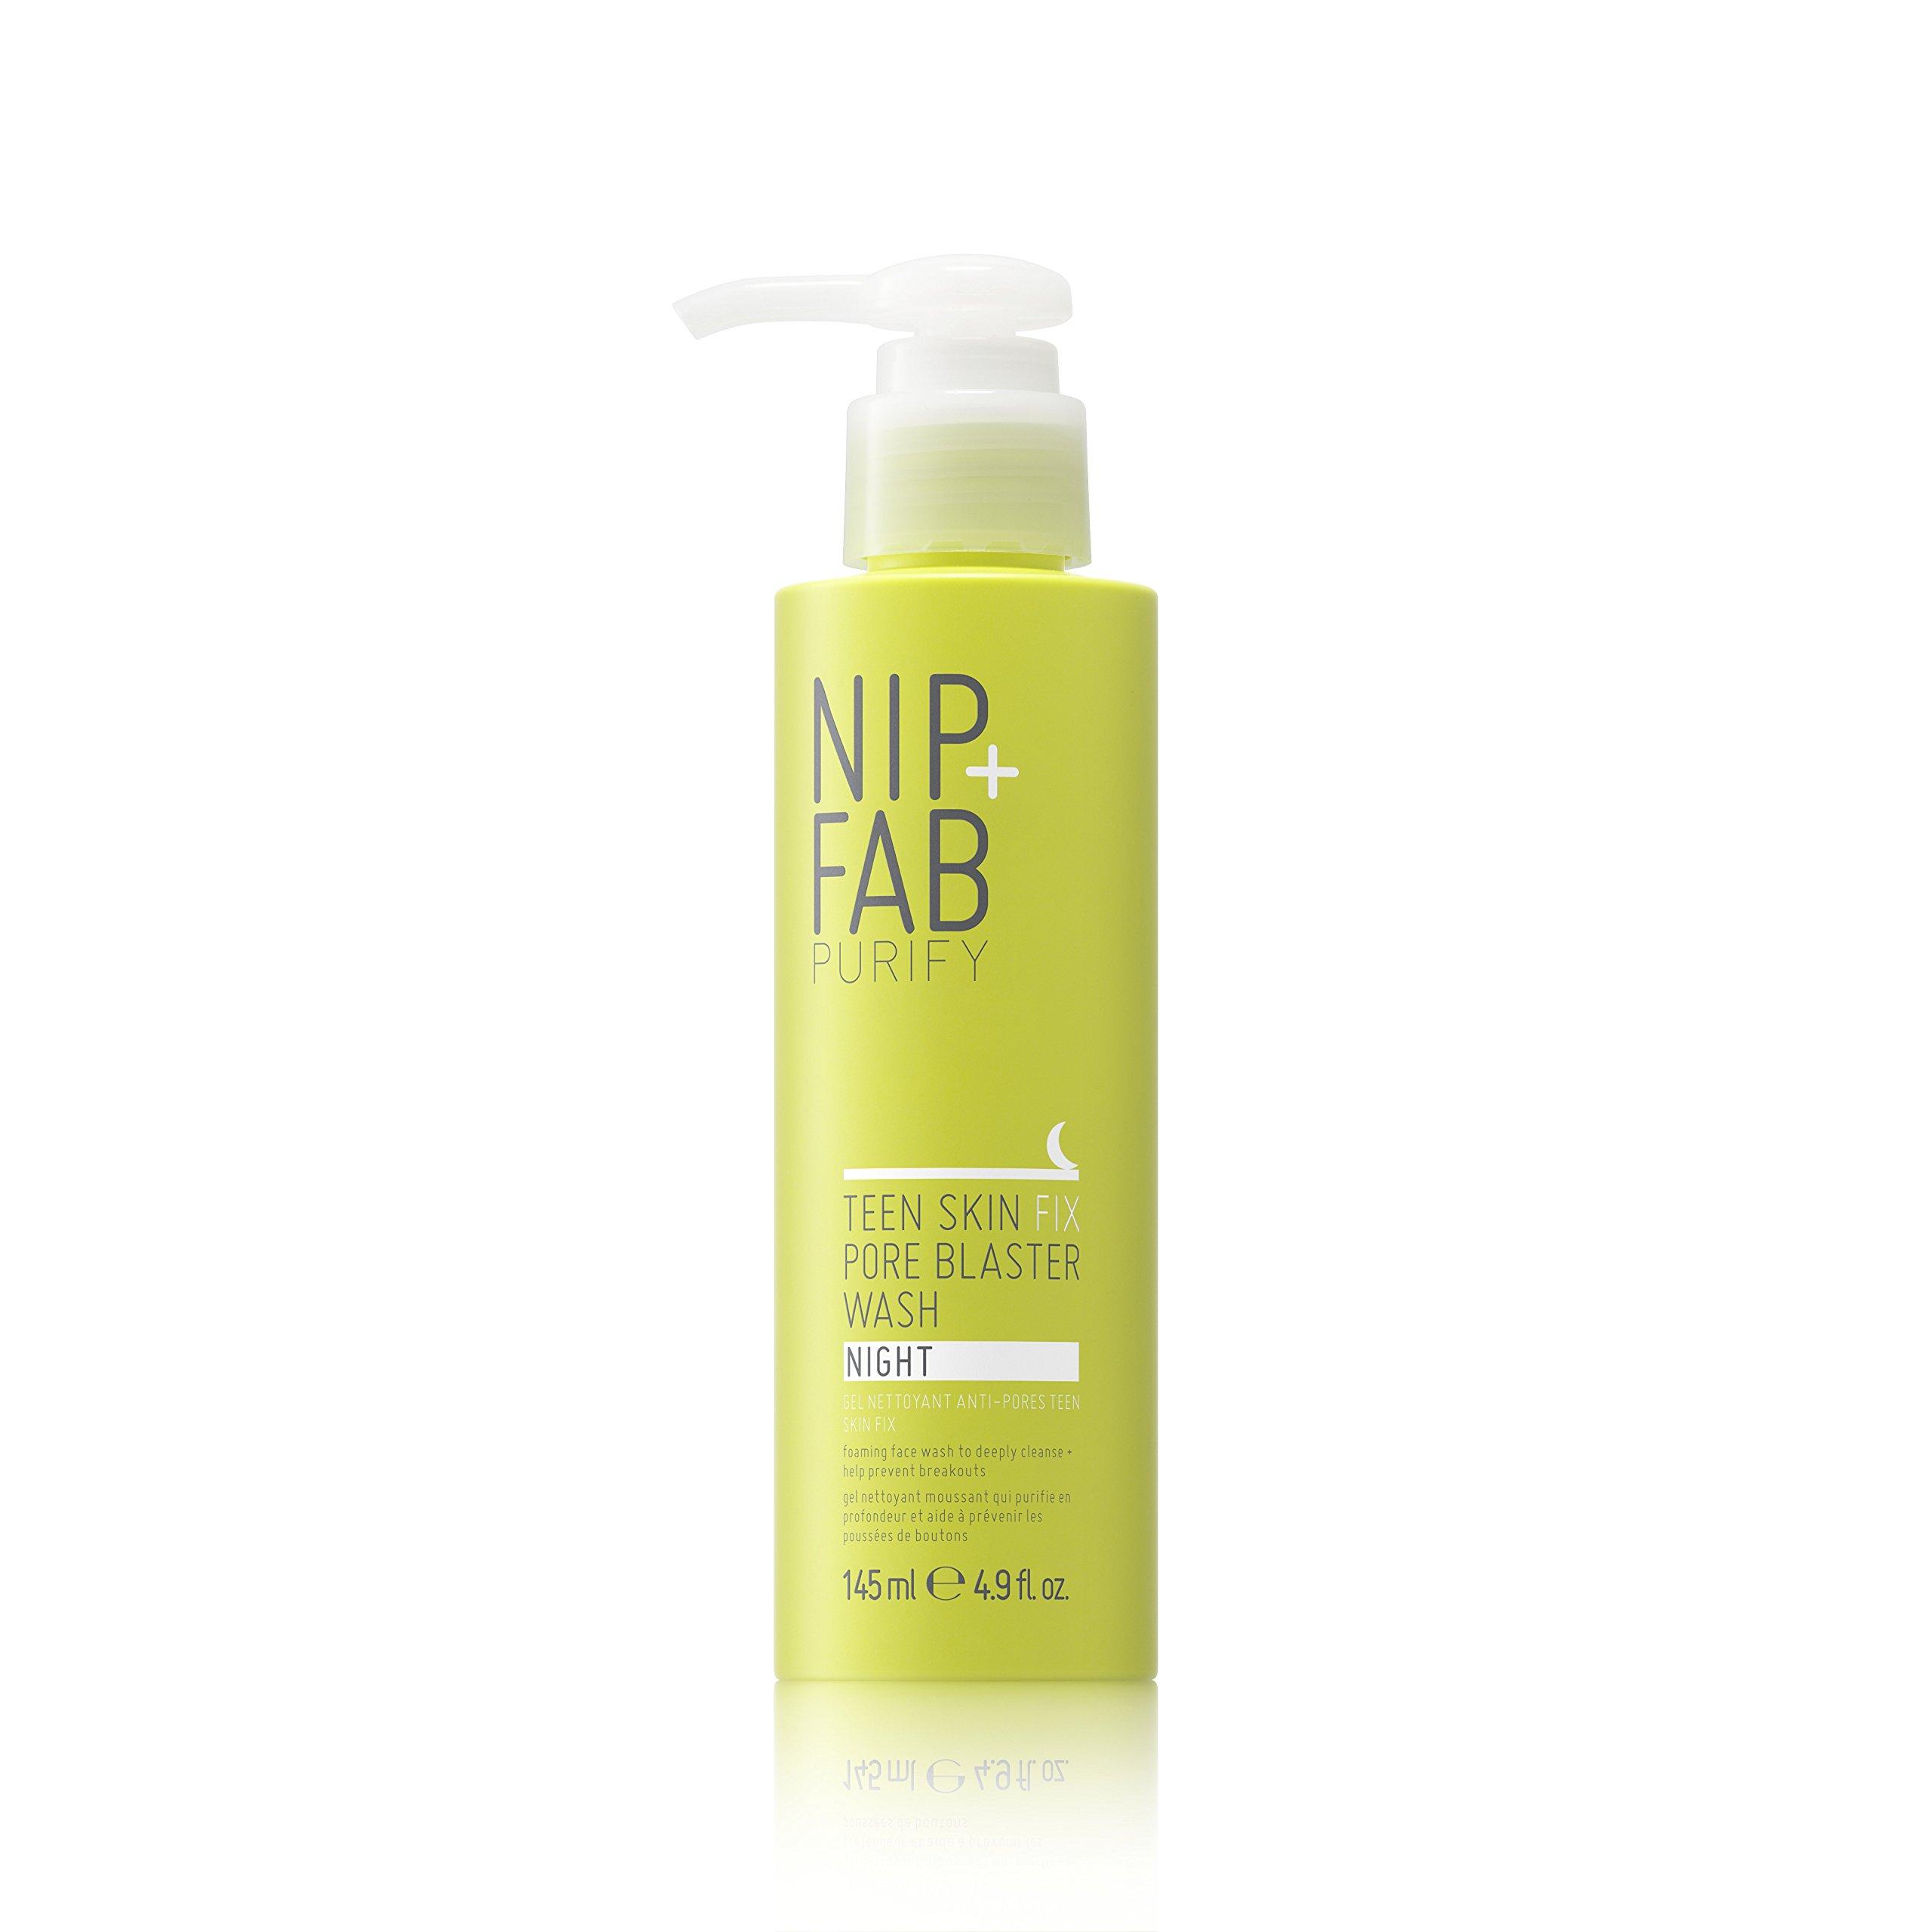 NIP+FAB Teen Skin Fix Pore Blaster Night Wash